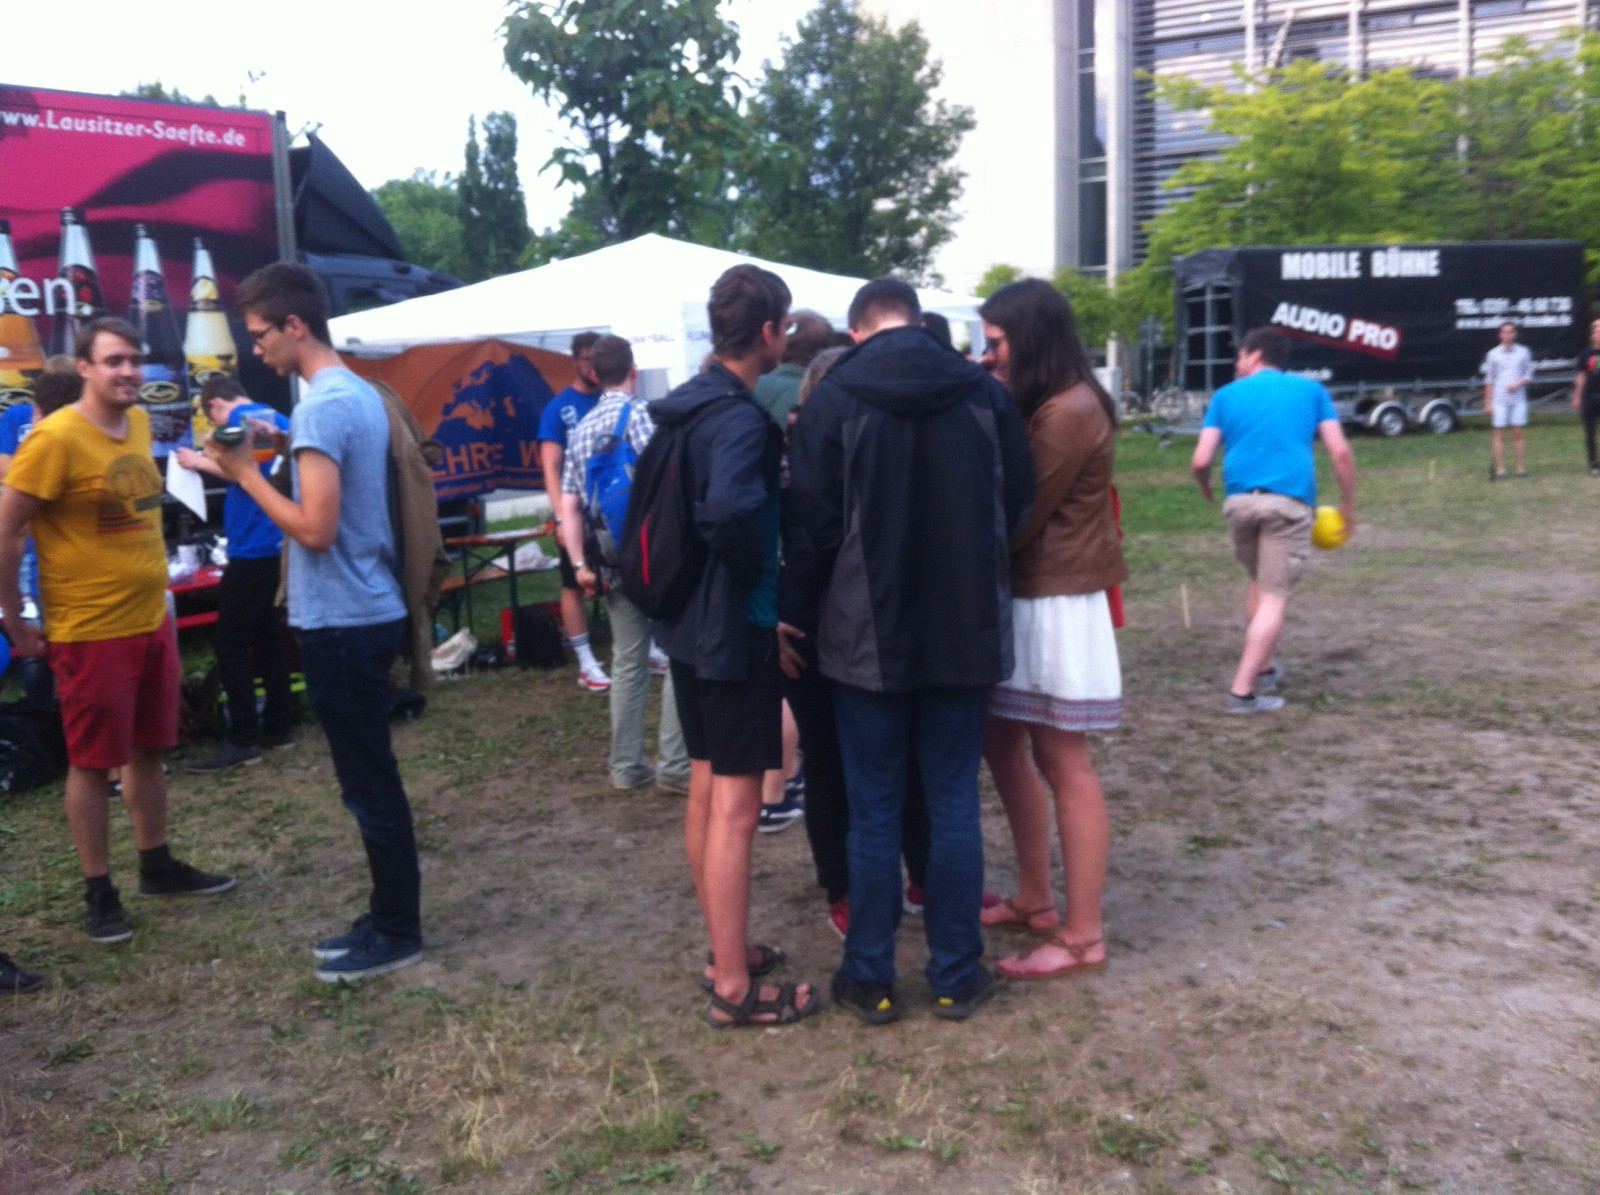 Flunkyball auf dem FSR-Sommerfest 2017